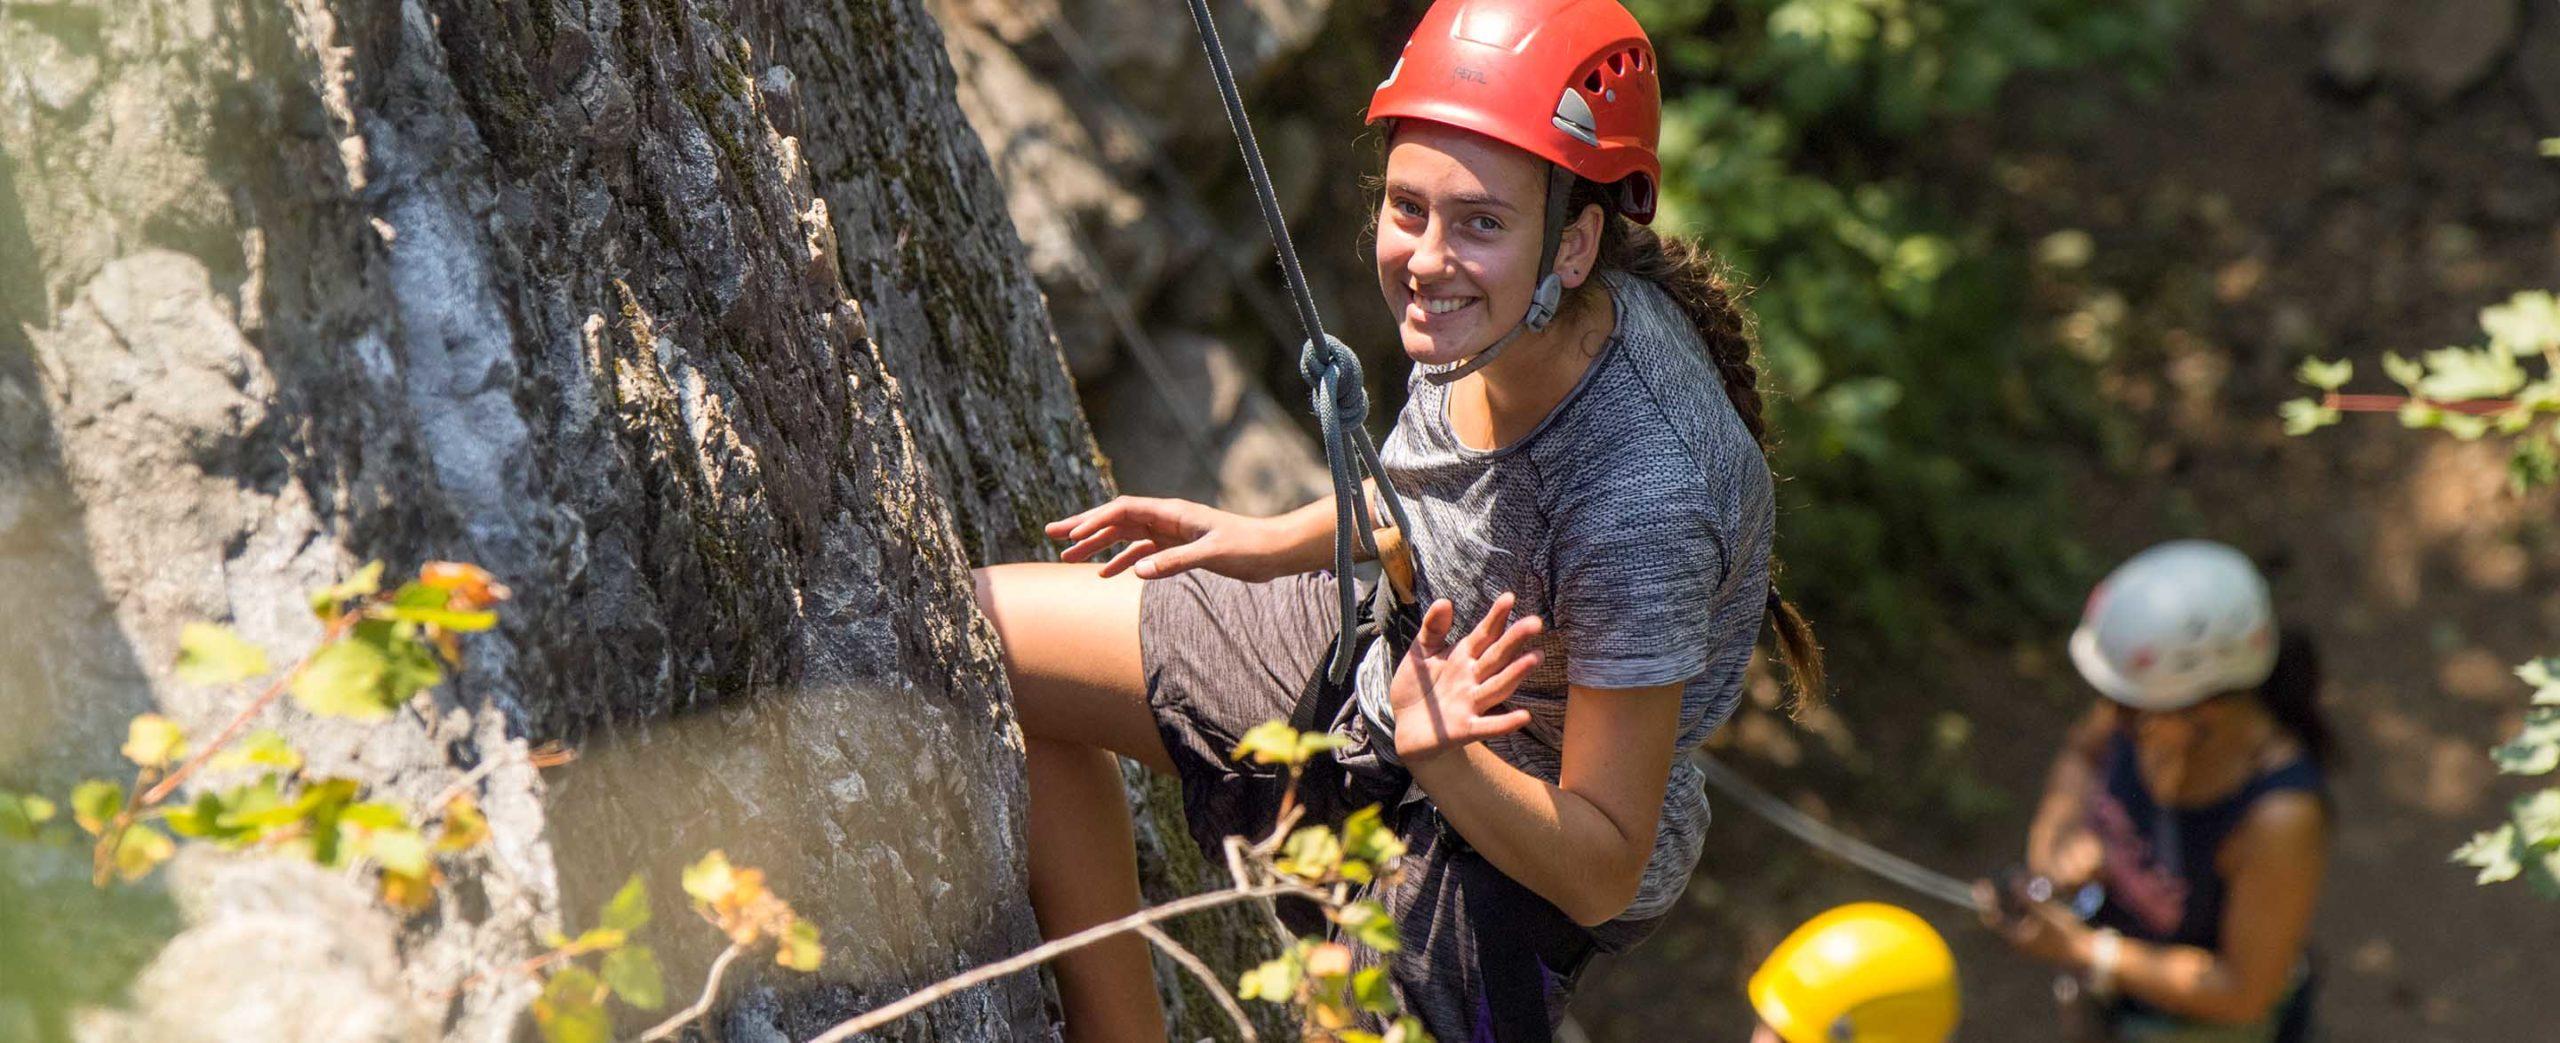 Rock climbing at Twinlow Camp in northern Idaho